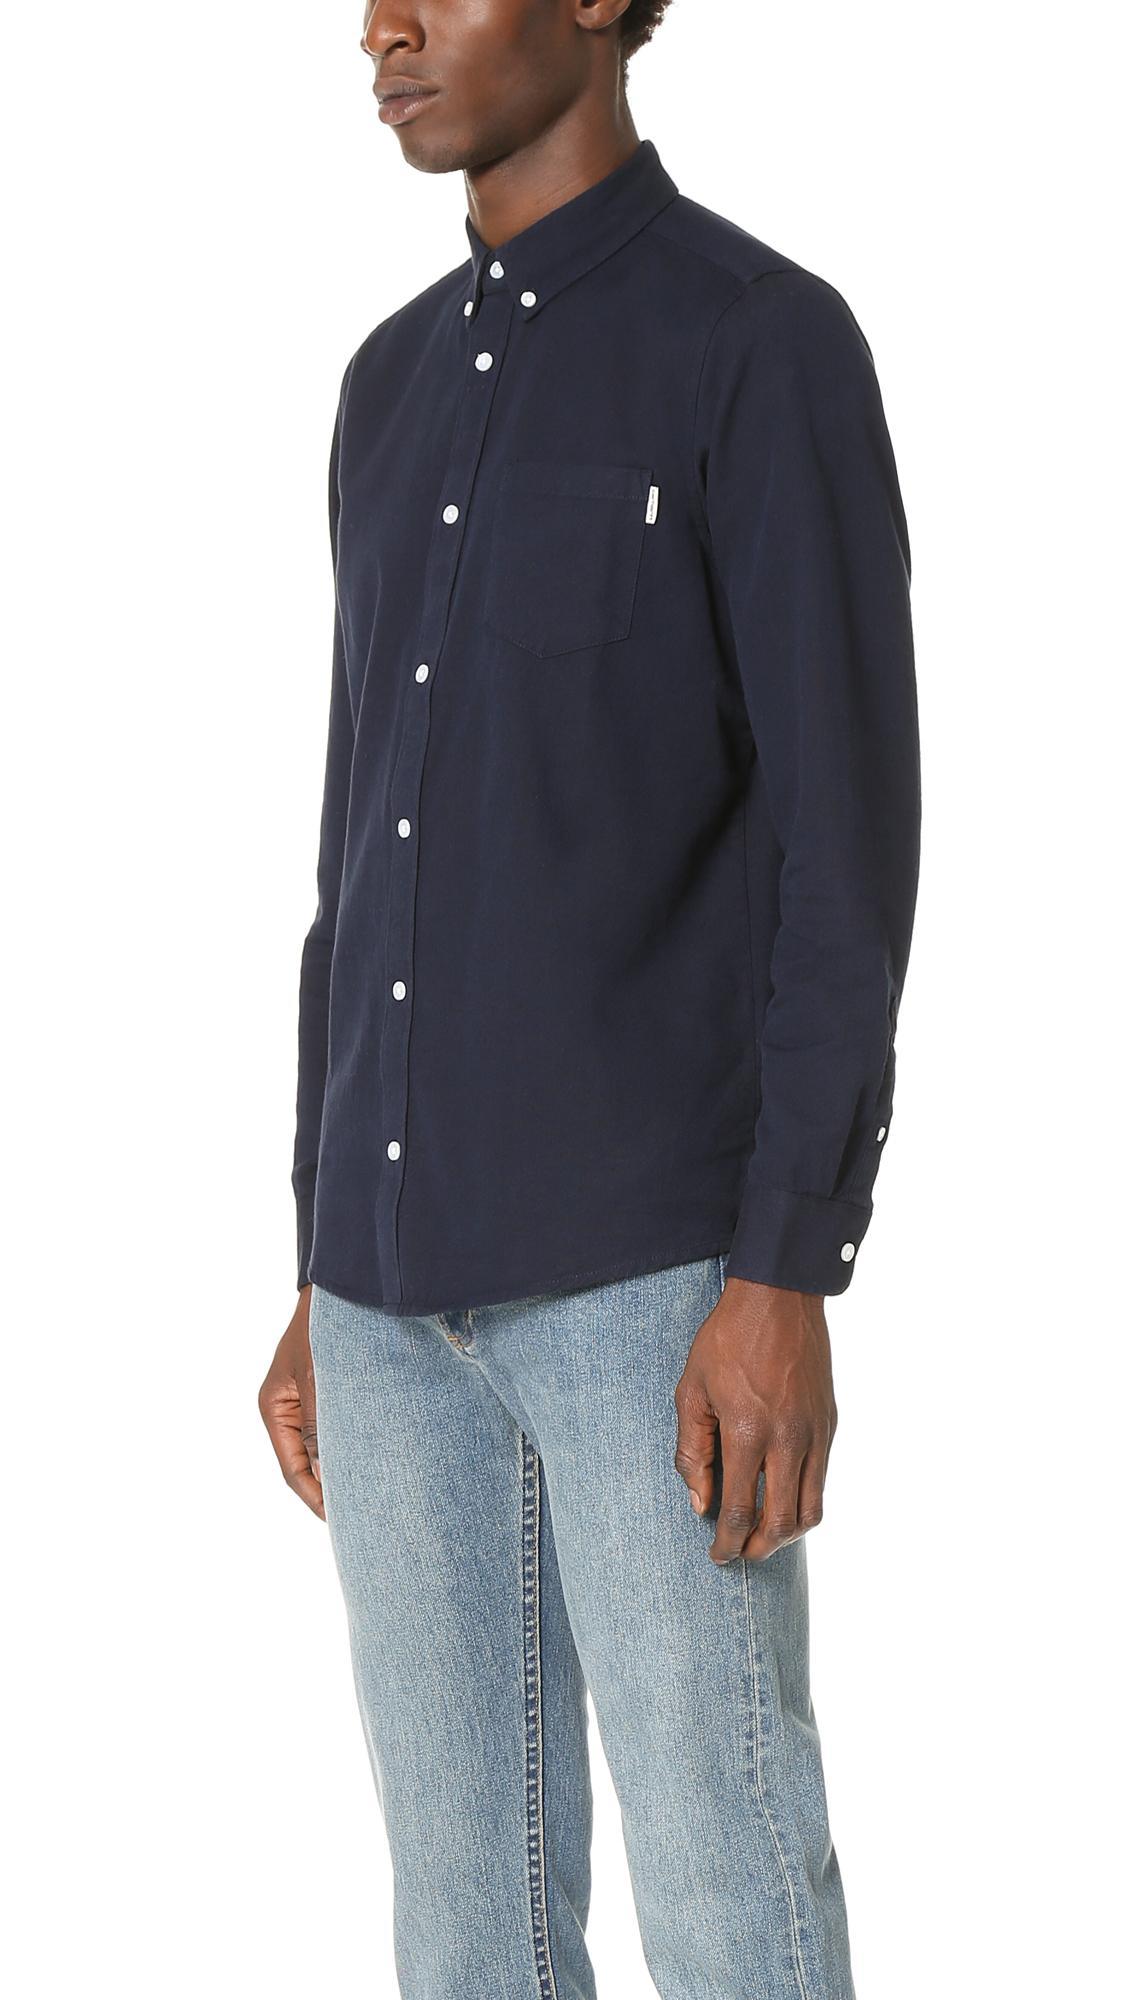 black single men in dalton Find great deals on ebay for dalton blazer  men's coats & jackets  dalton & forsythe new man black single breasted suit blazer pants size 46 it nwt.